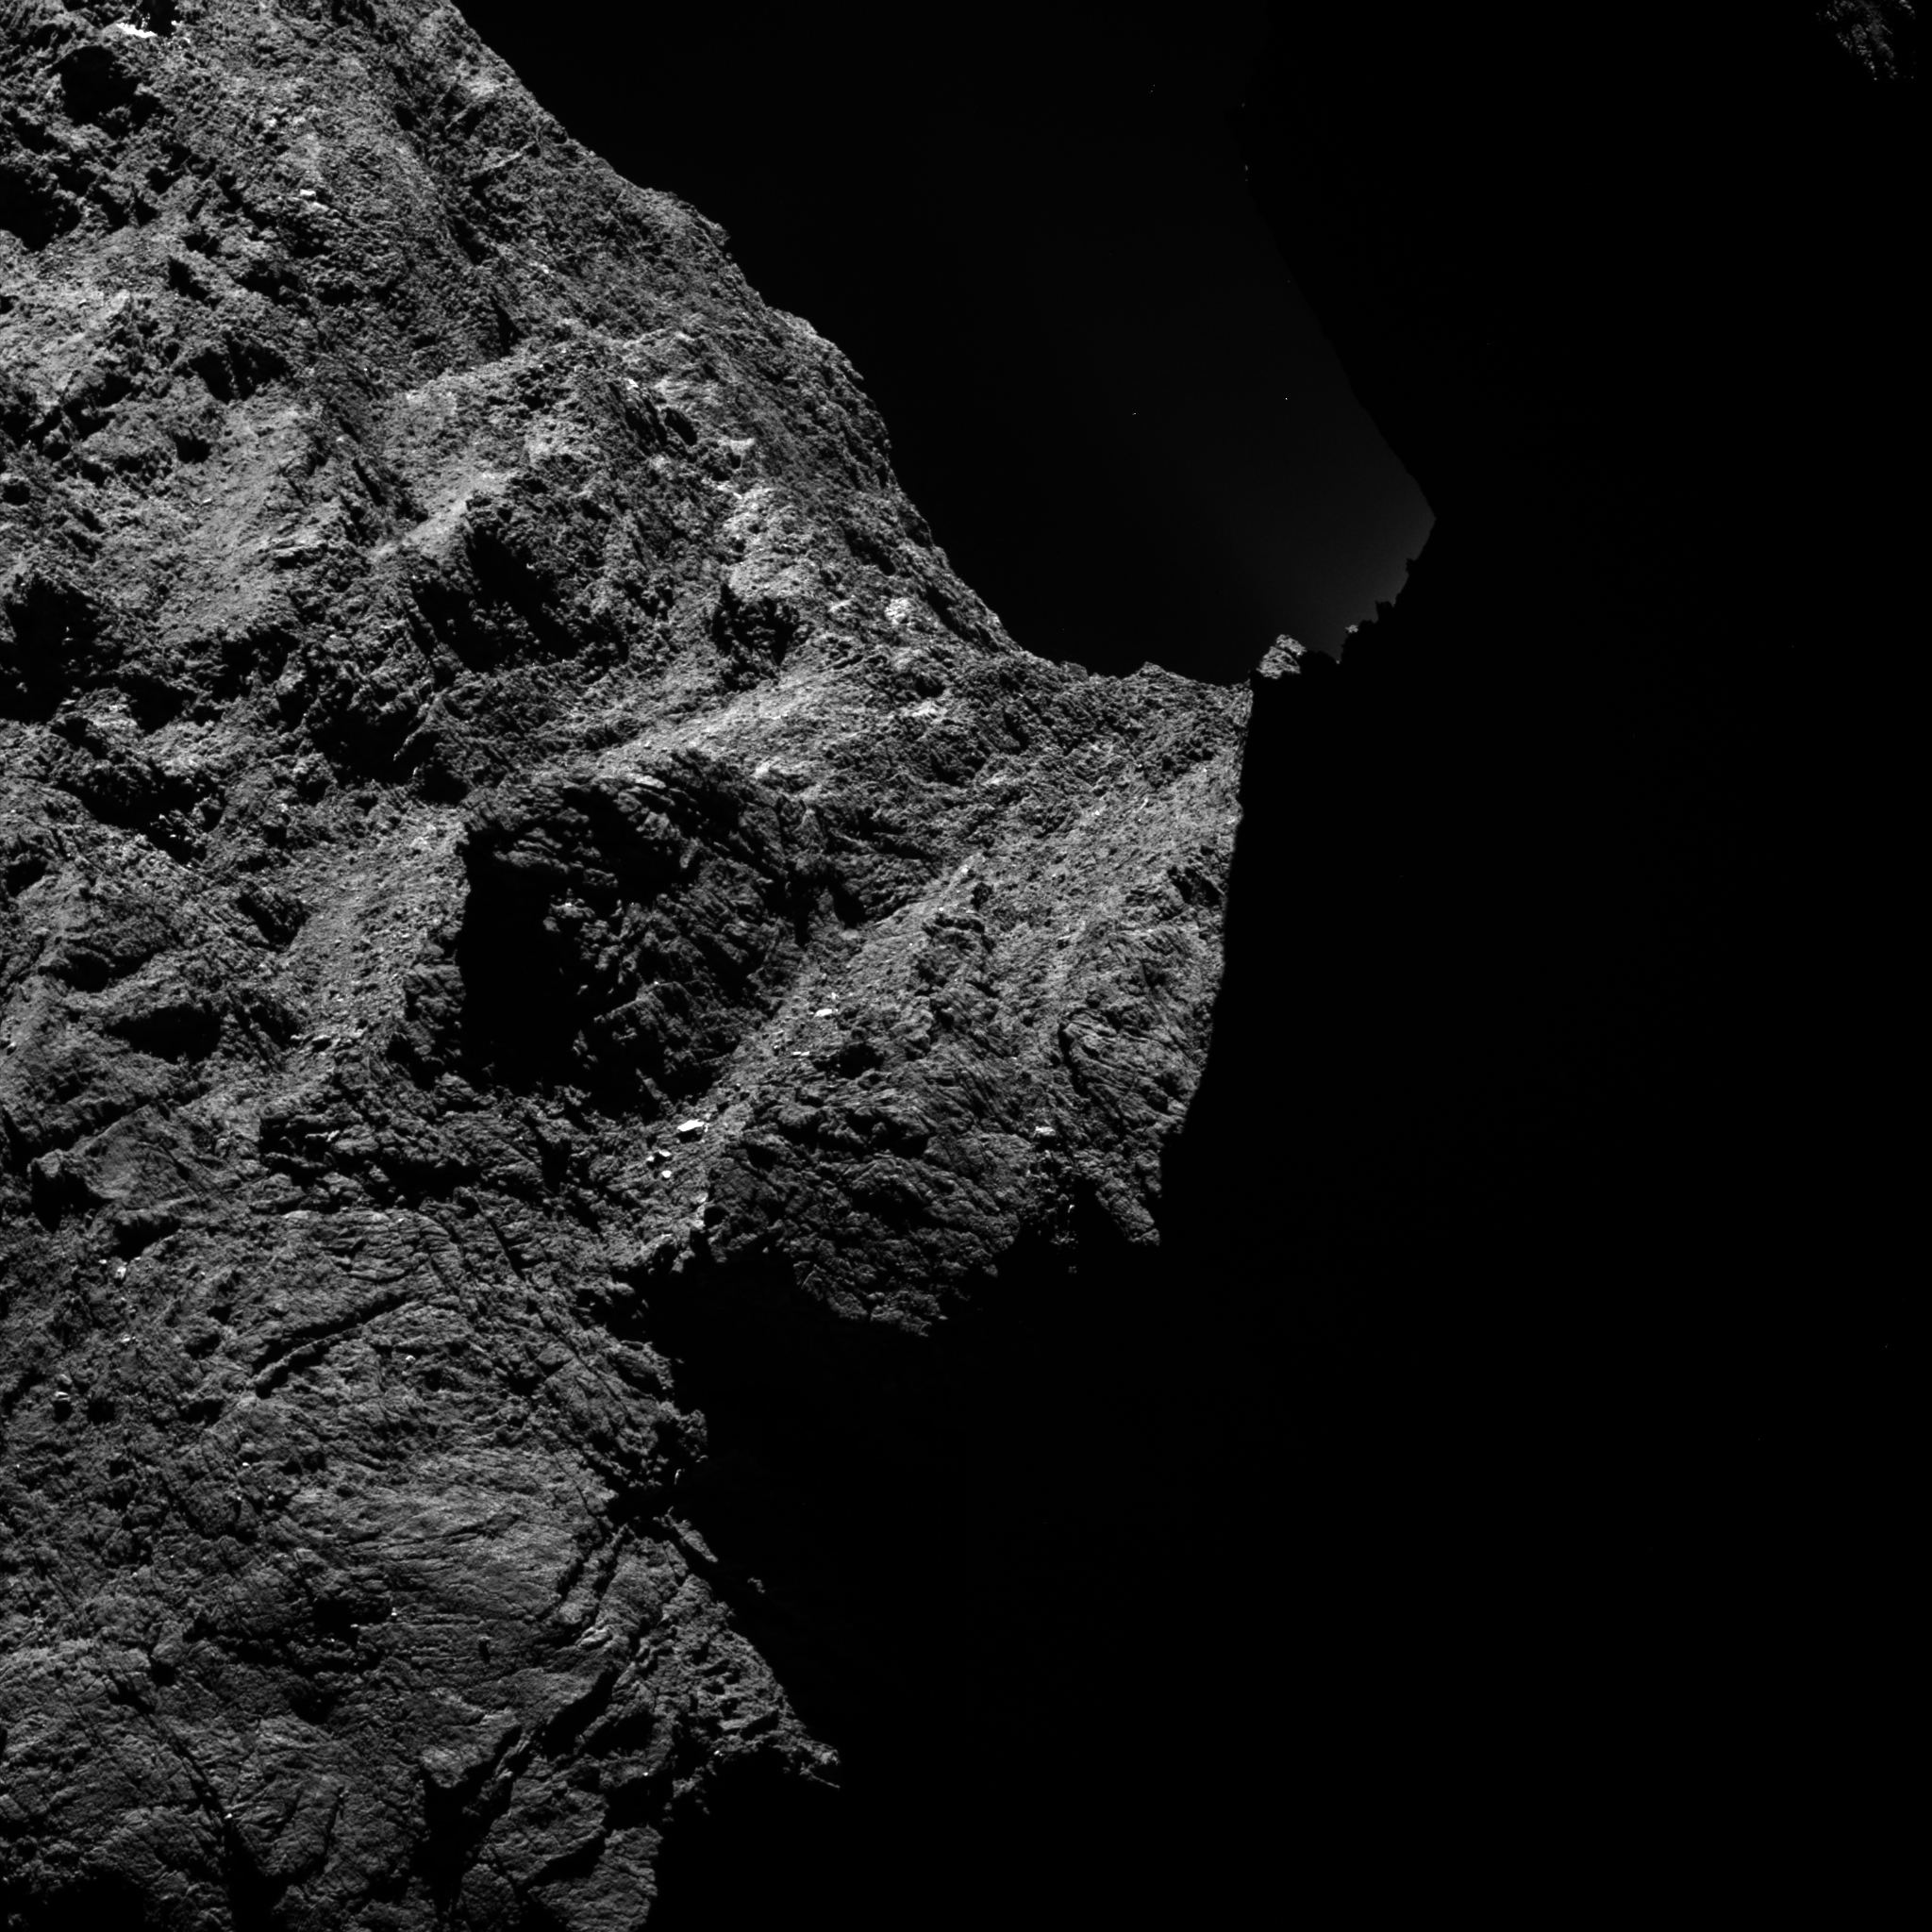 nasa comet lander name - photo #18